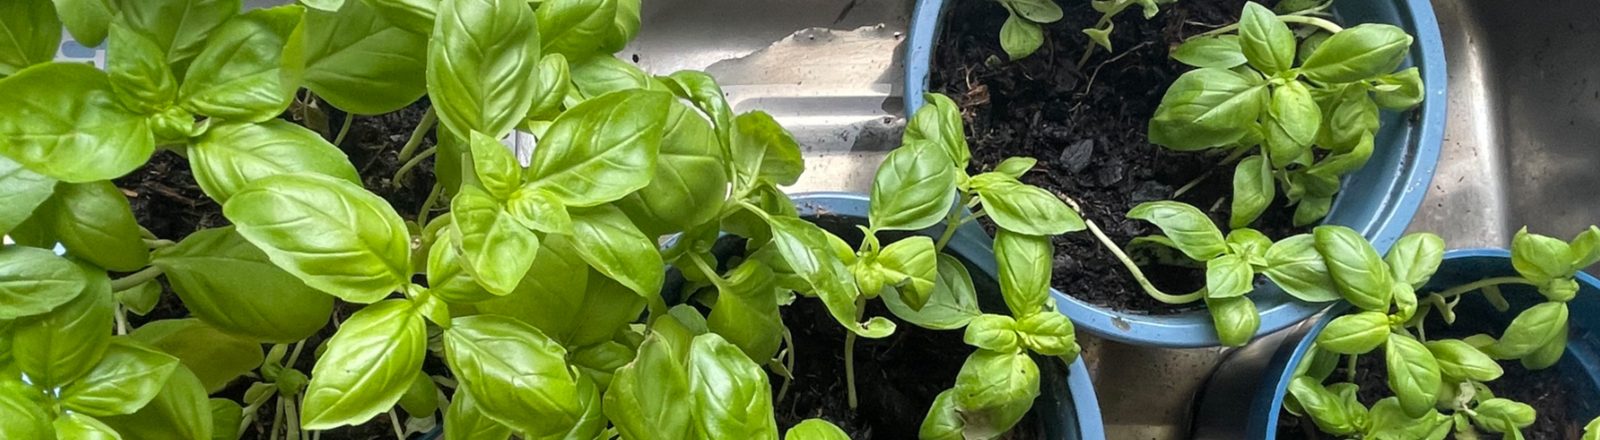 Töpfe mit selbst gepflanztem basilikum